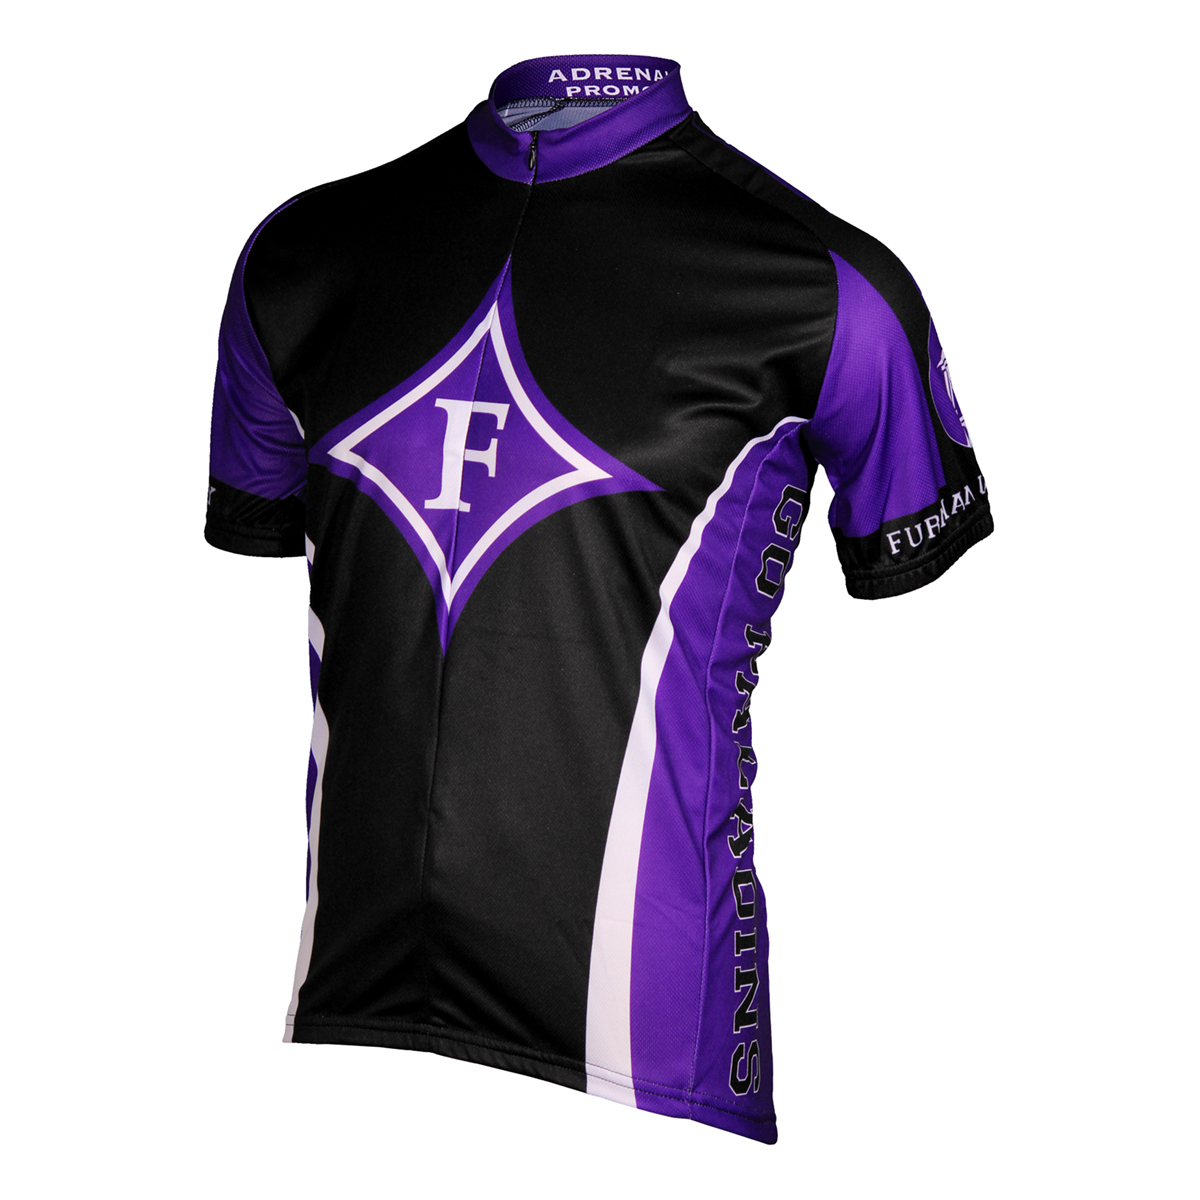 Adrenaline Promotions Furman University Cycling Jersey